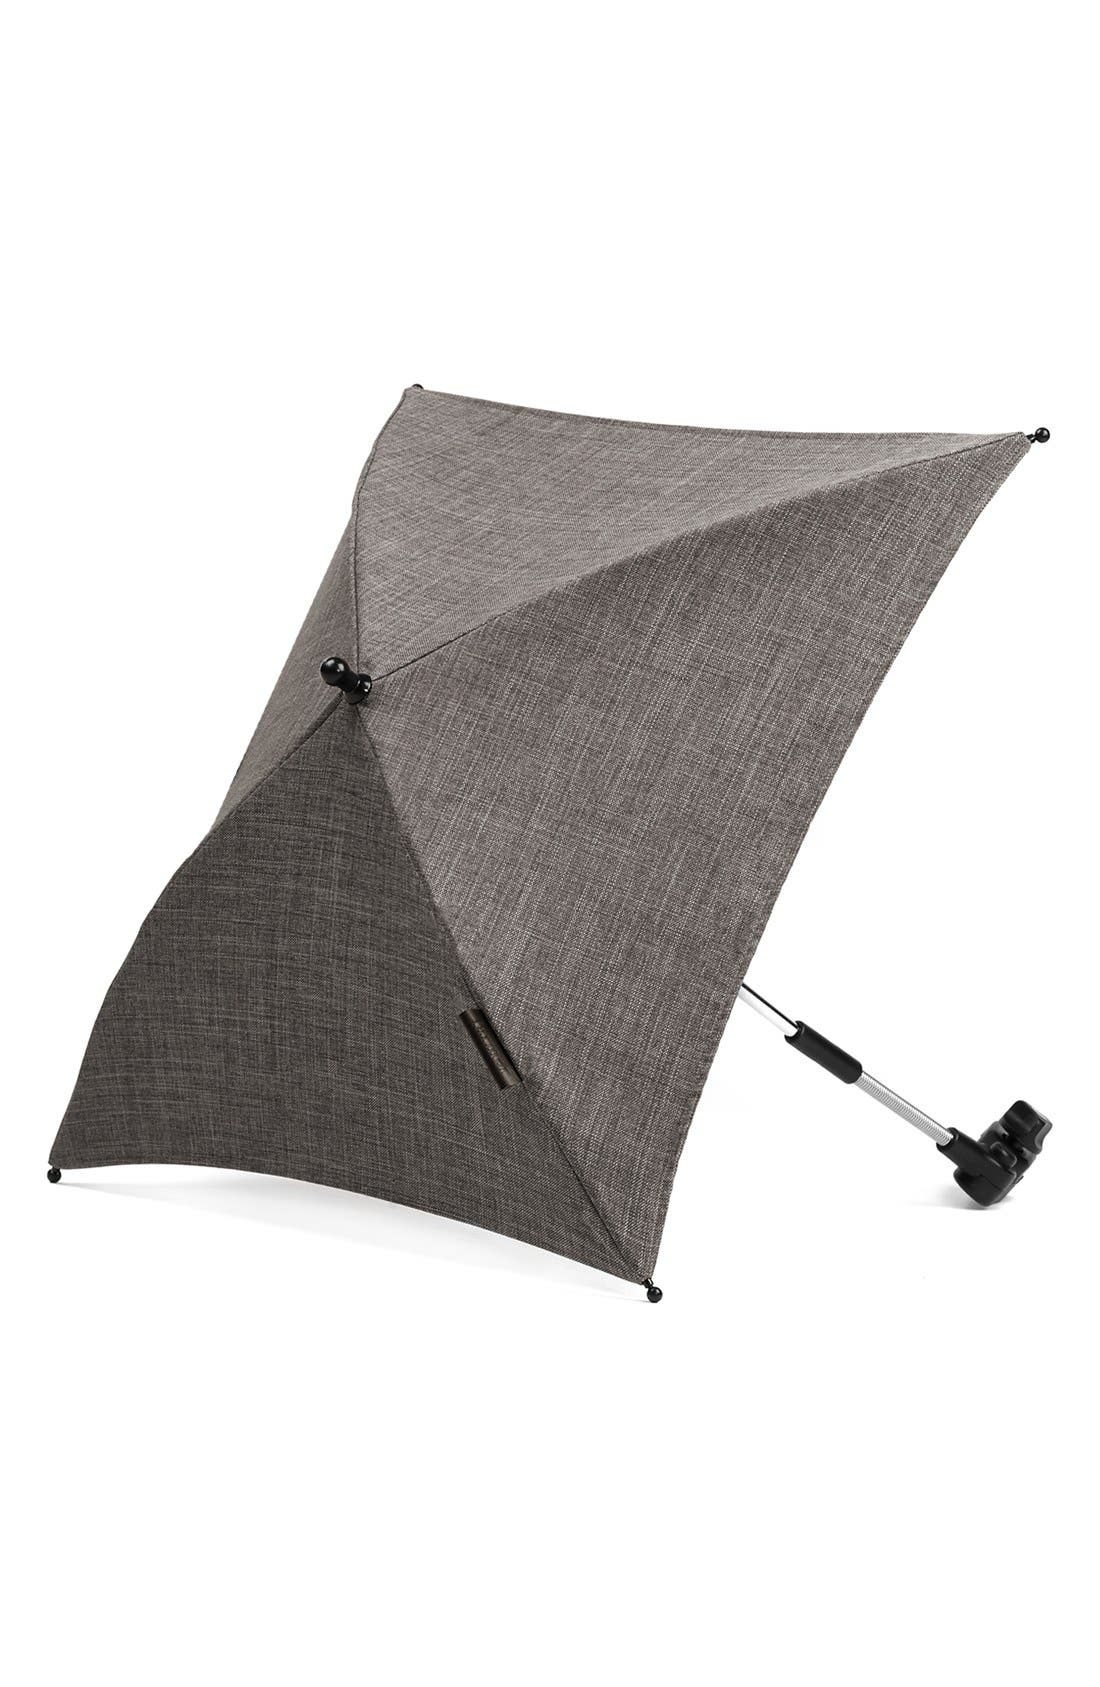 Mutsy 'Evo - Famer Earth' Stroller Umbrella